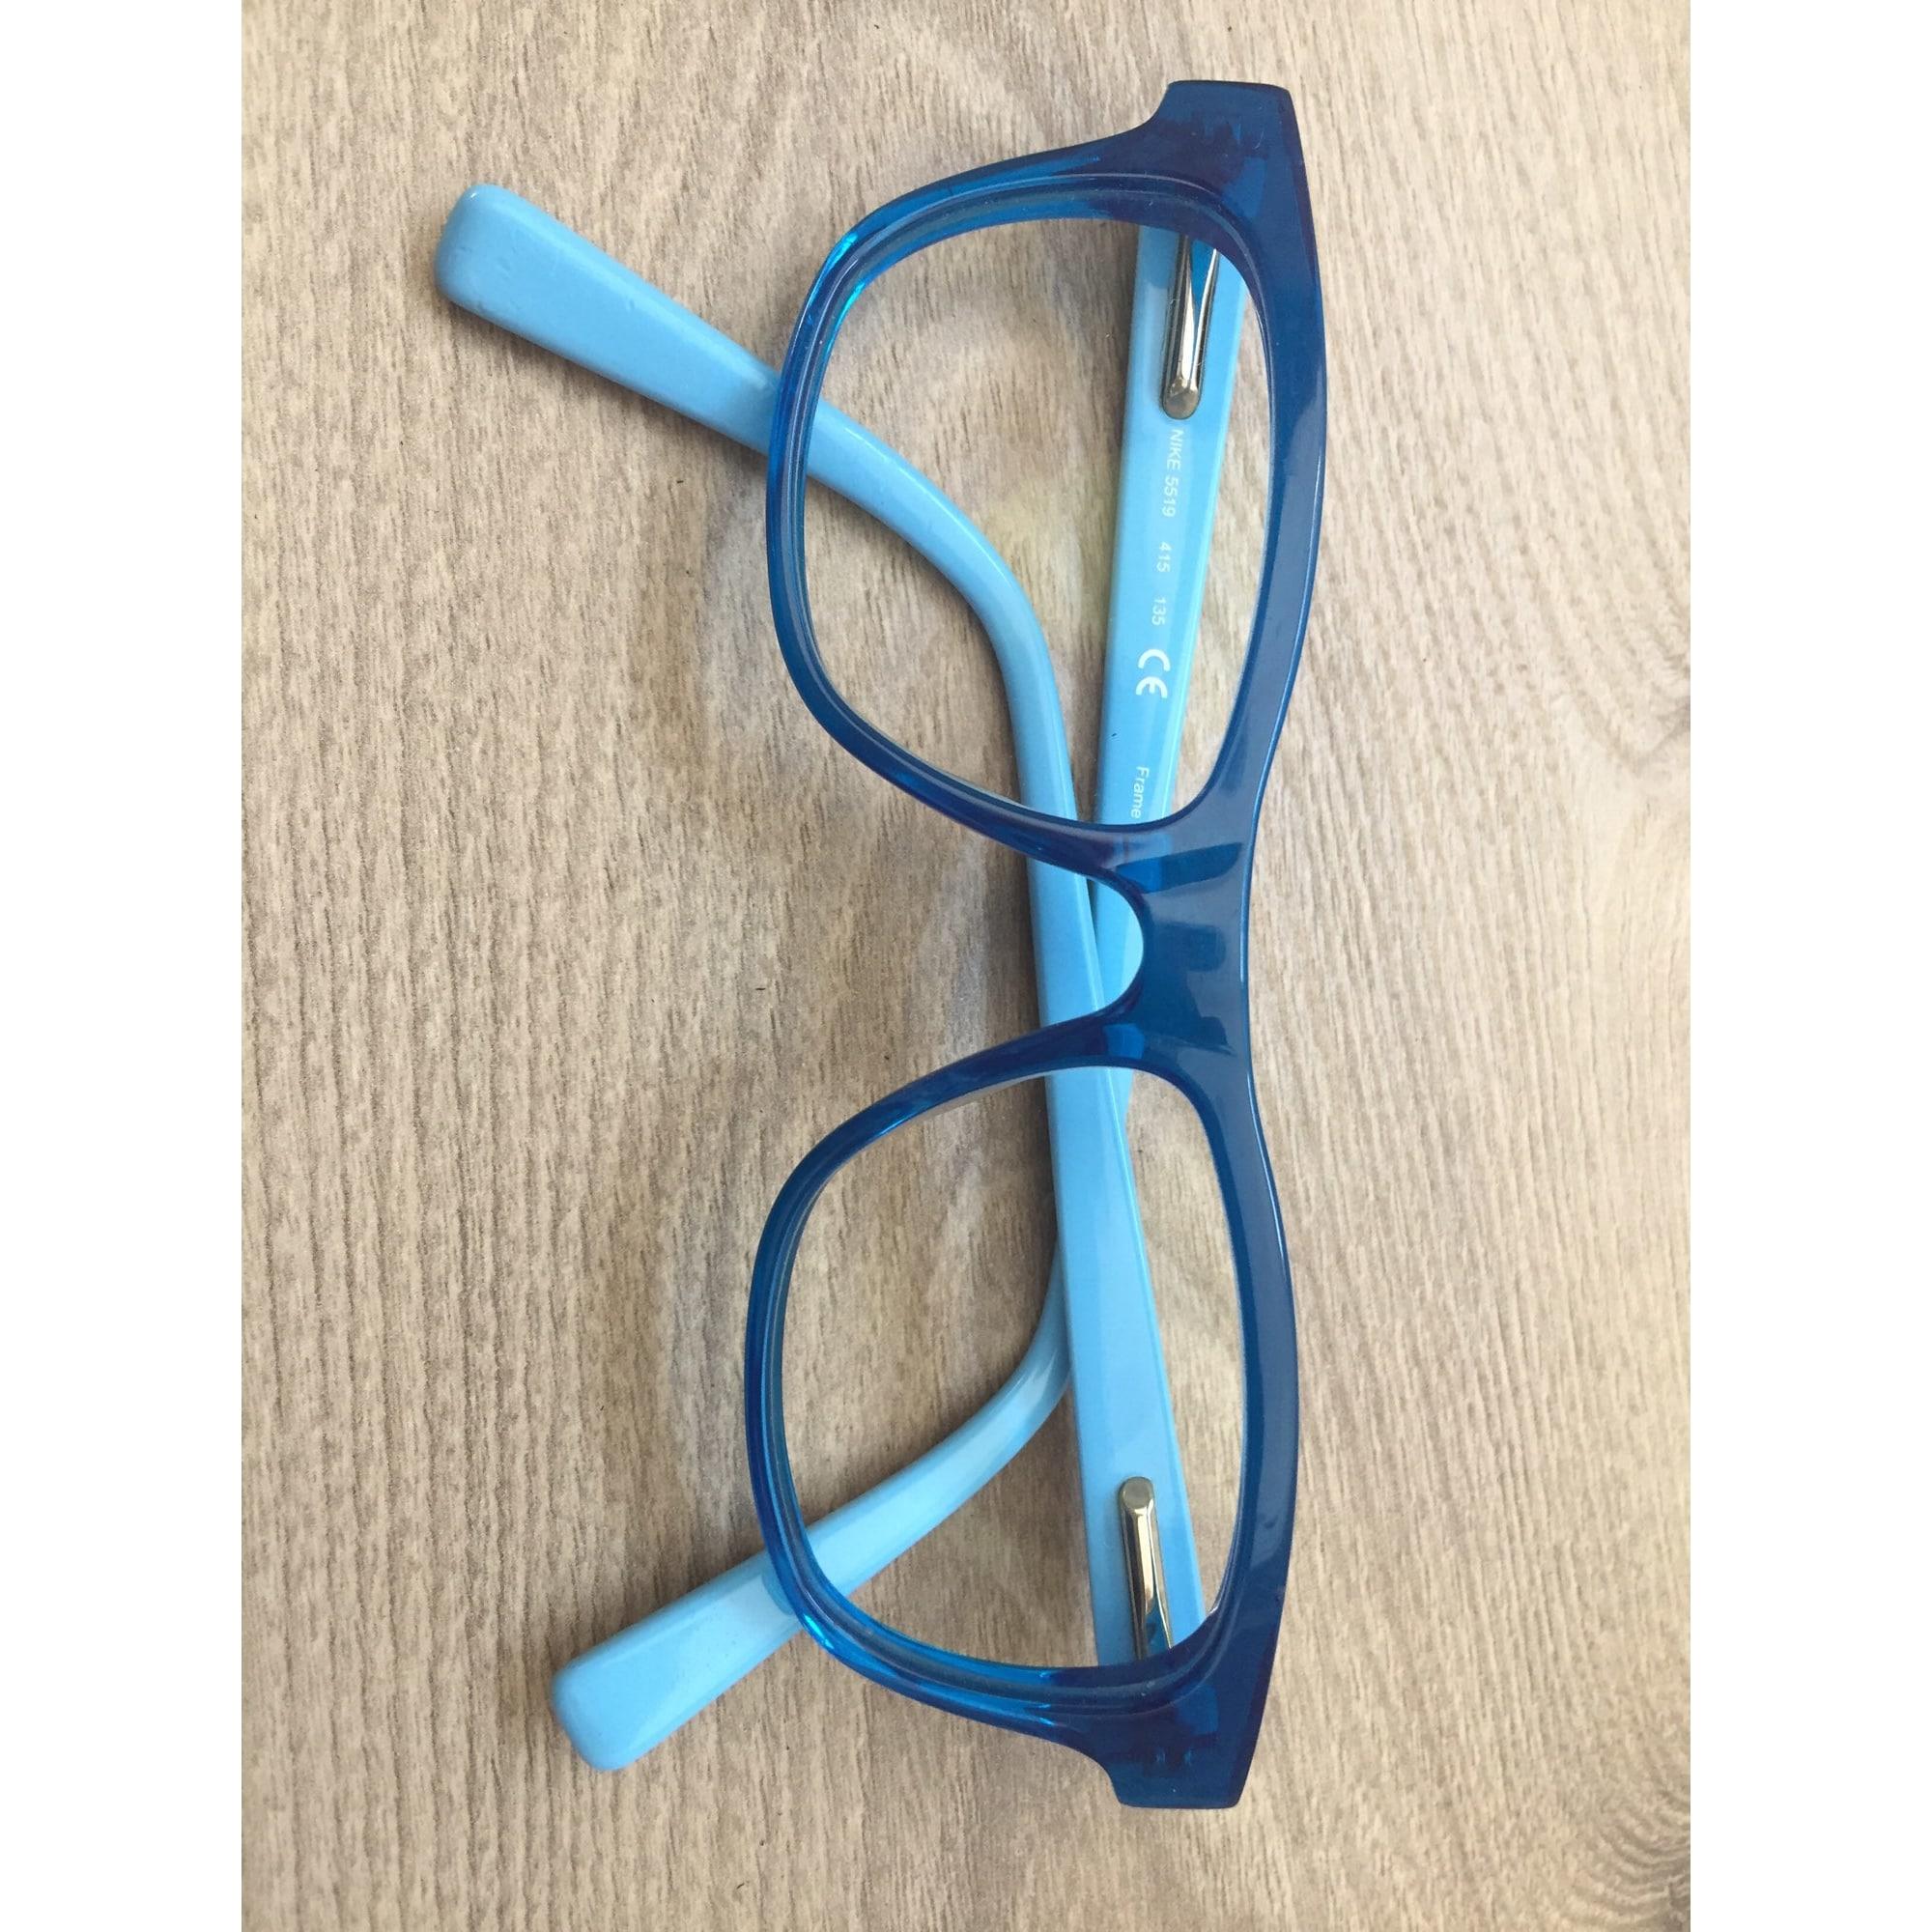 f06e368e4e023 Monture de lunettes NIKE 7-8 ans bleu - 8298141